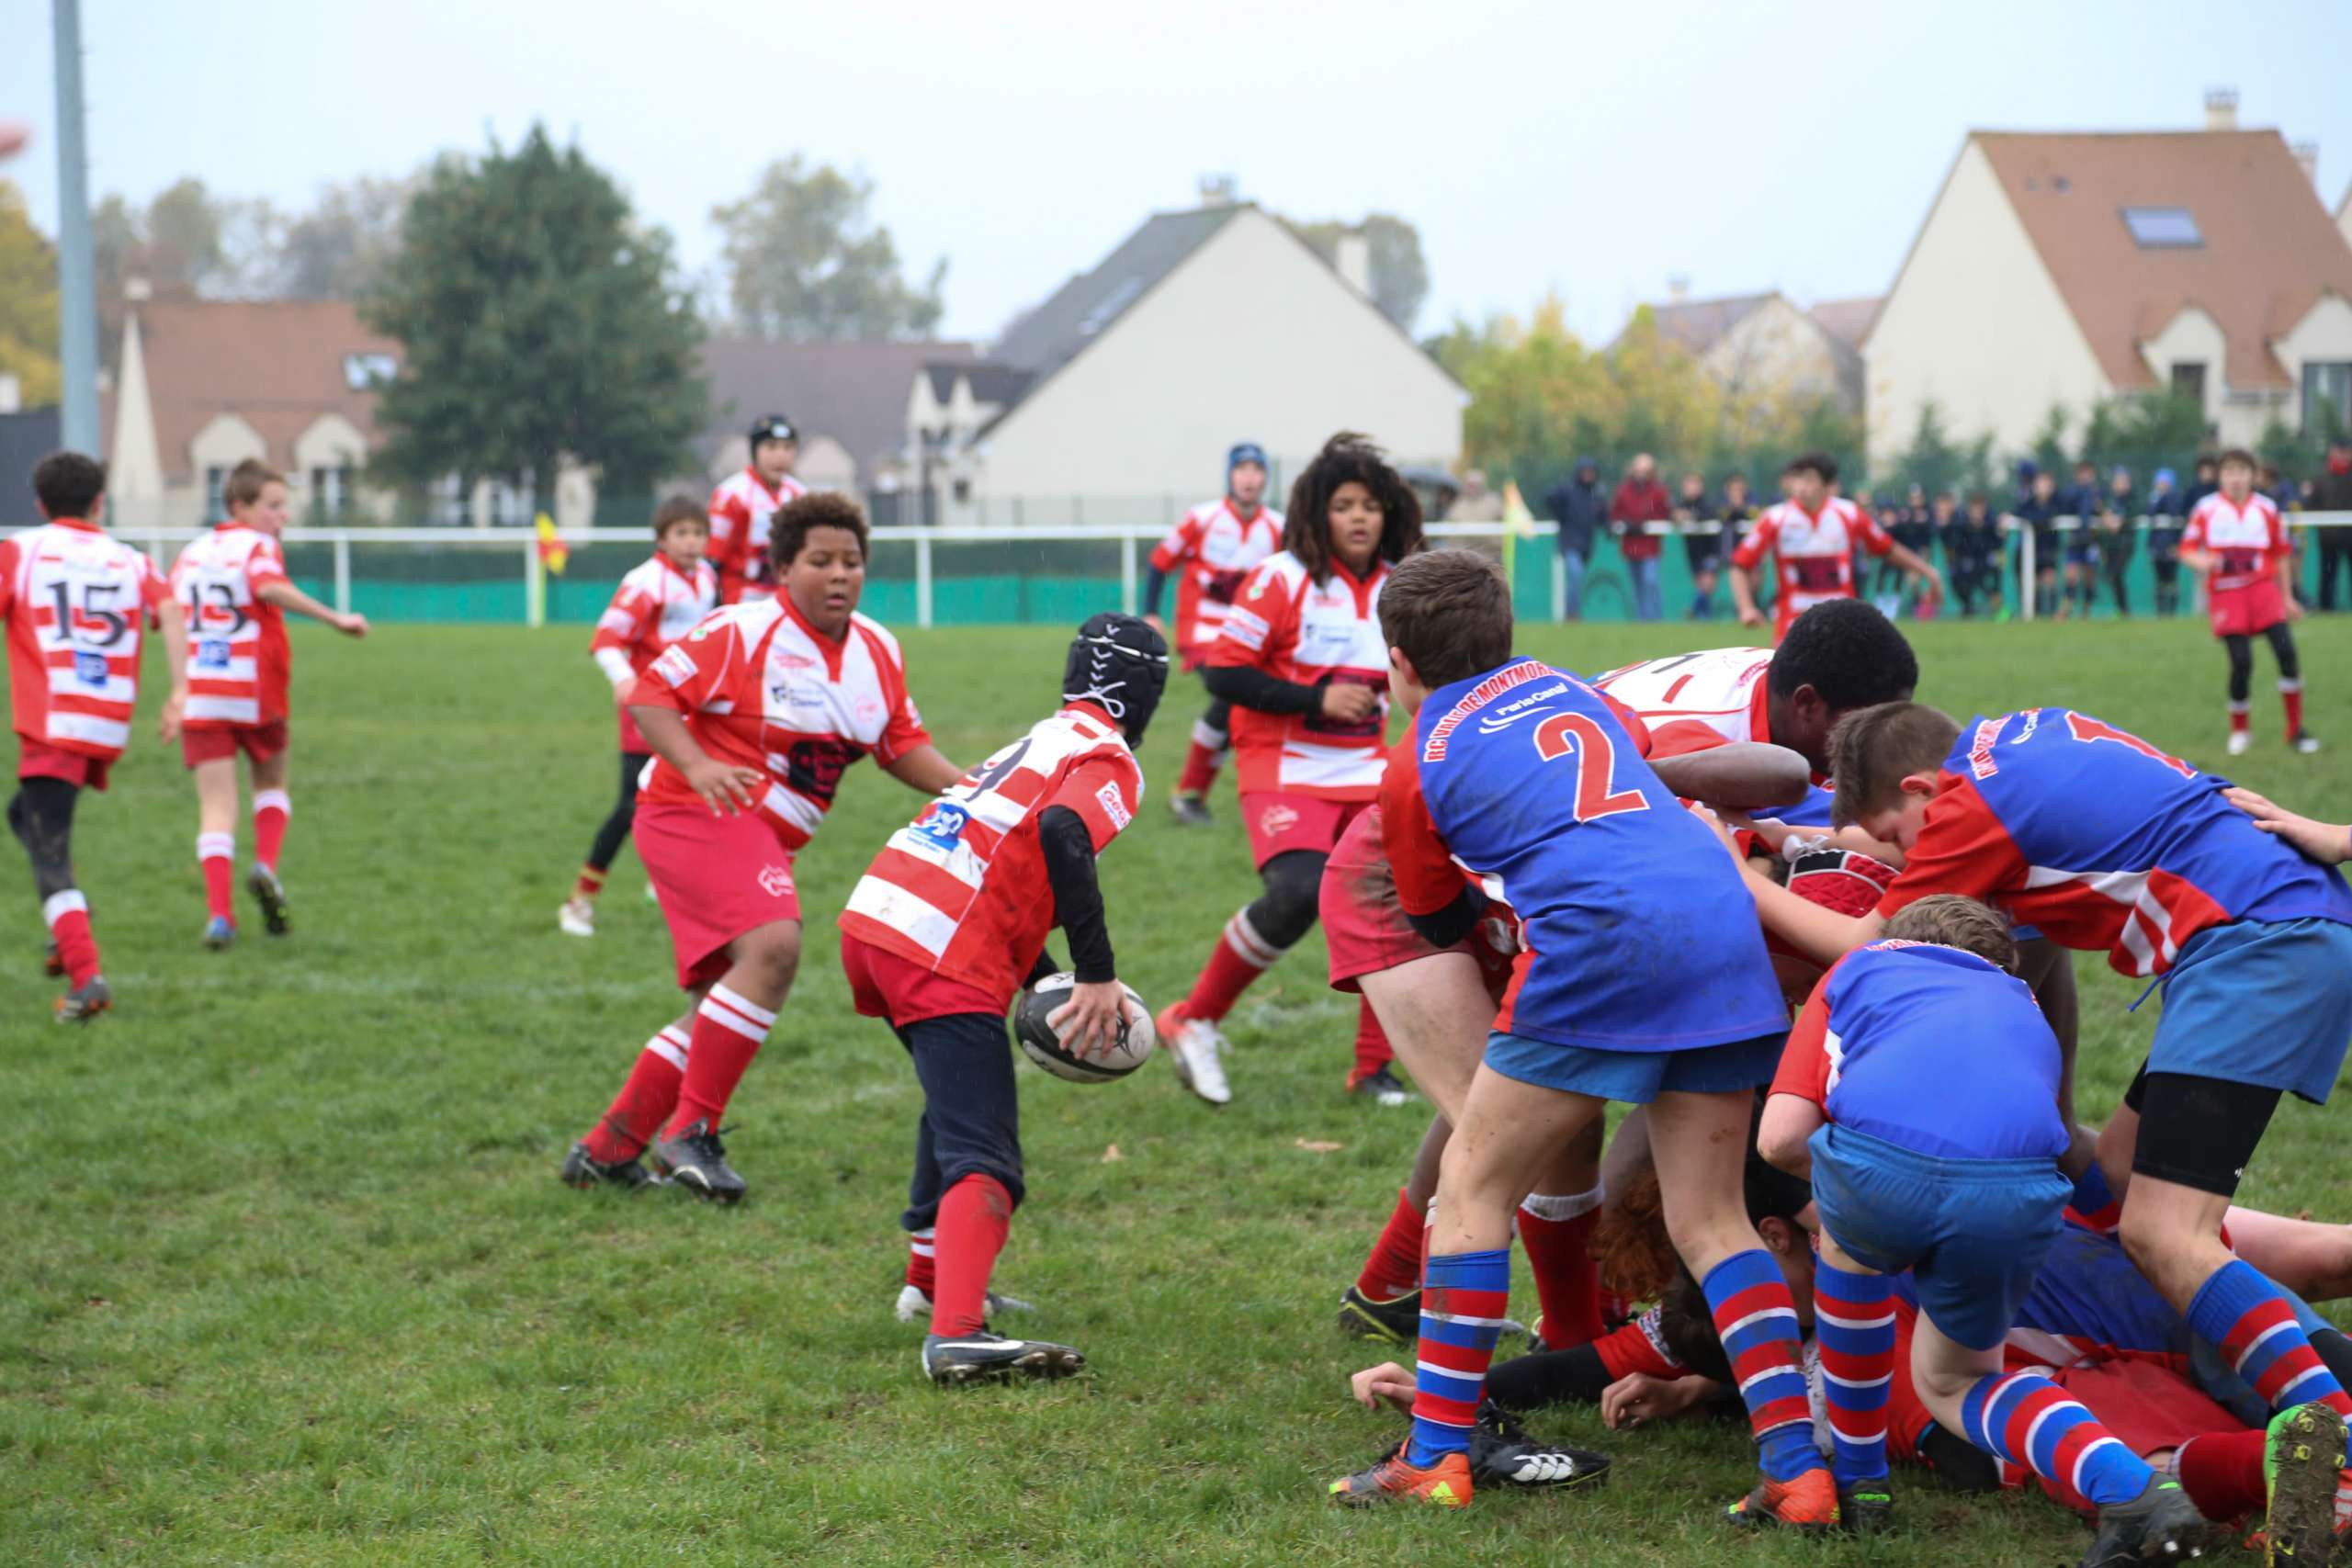 Clamart Rugby 92 - Rencontres CIFR U14 2003-